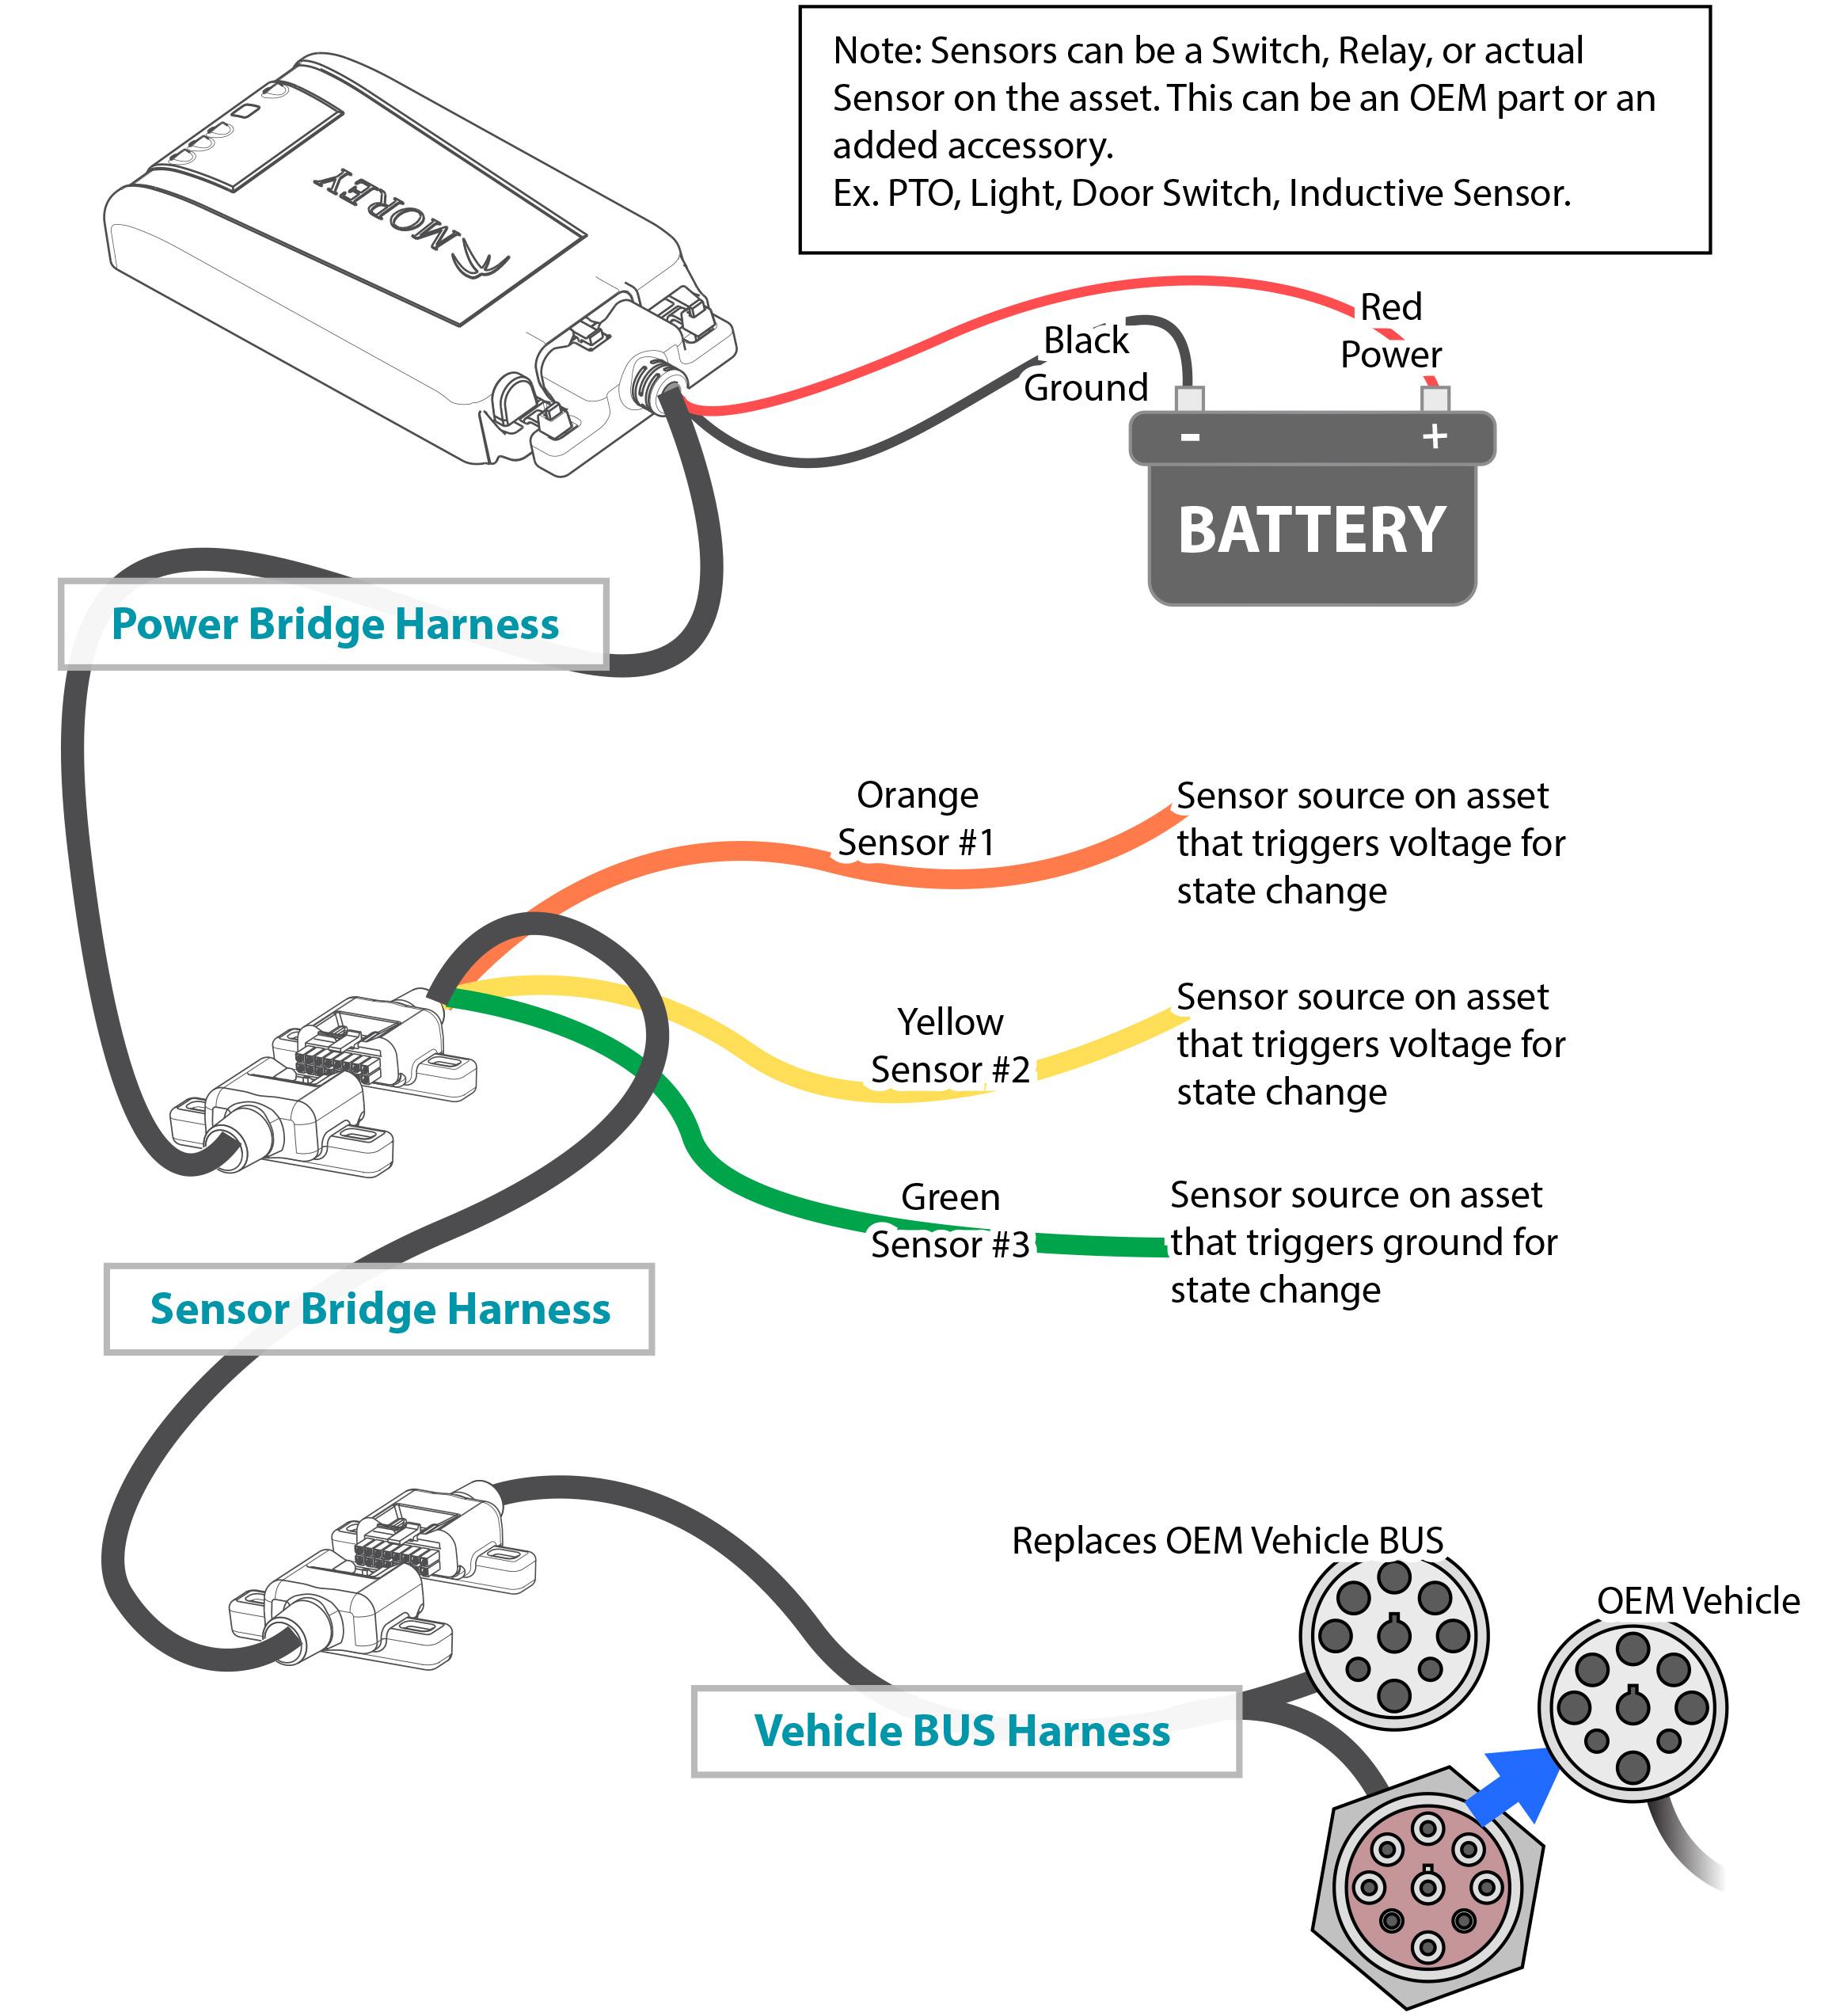 MC Power Bridge Harness, Sensor Bridge Harness and Vehicle BUS Harness Configuration